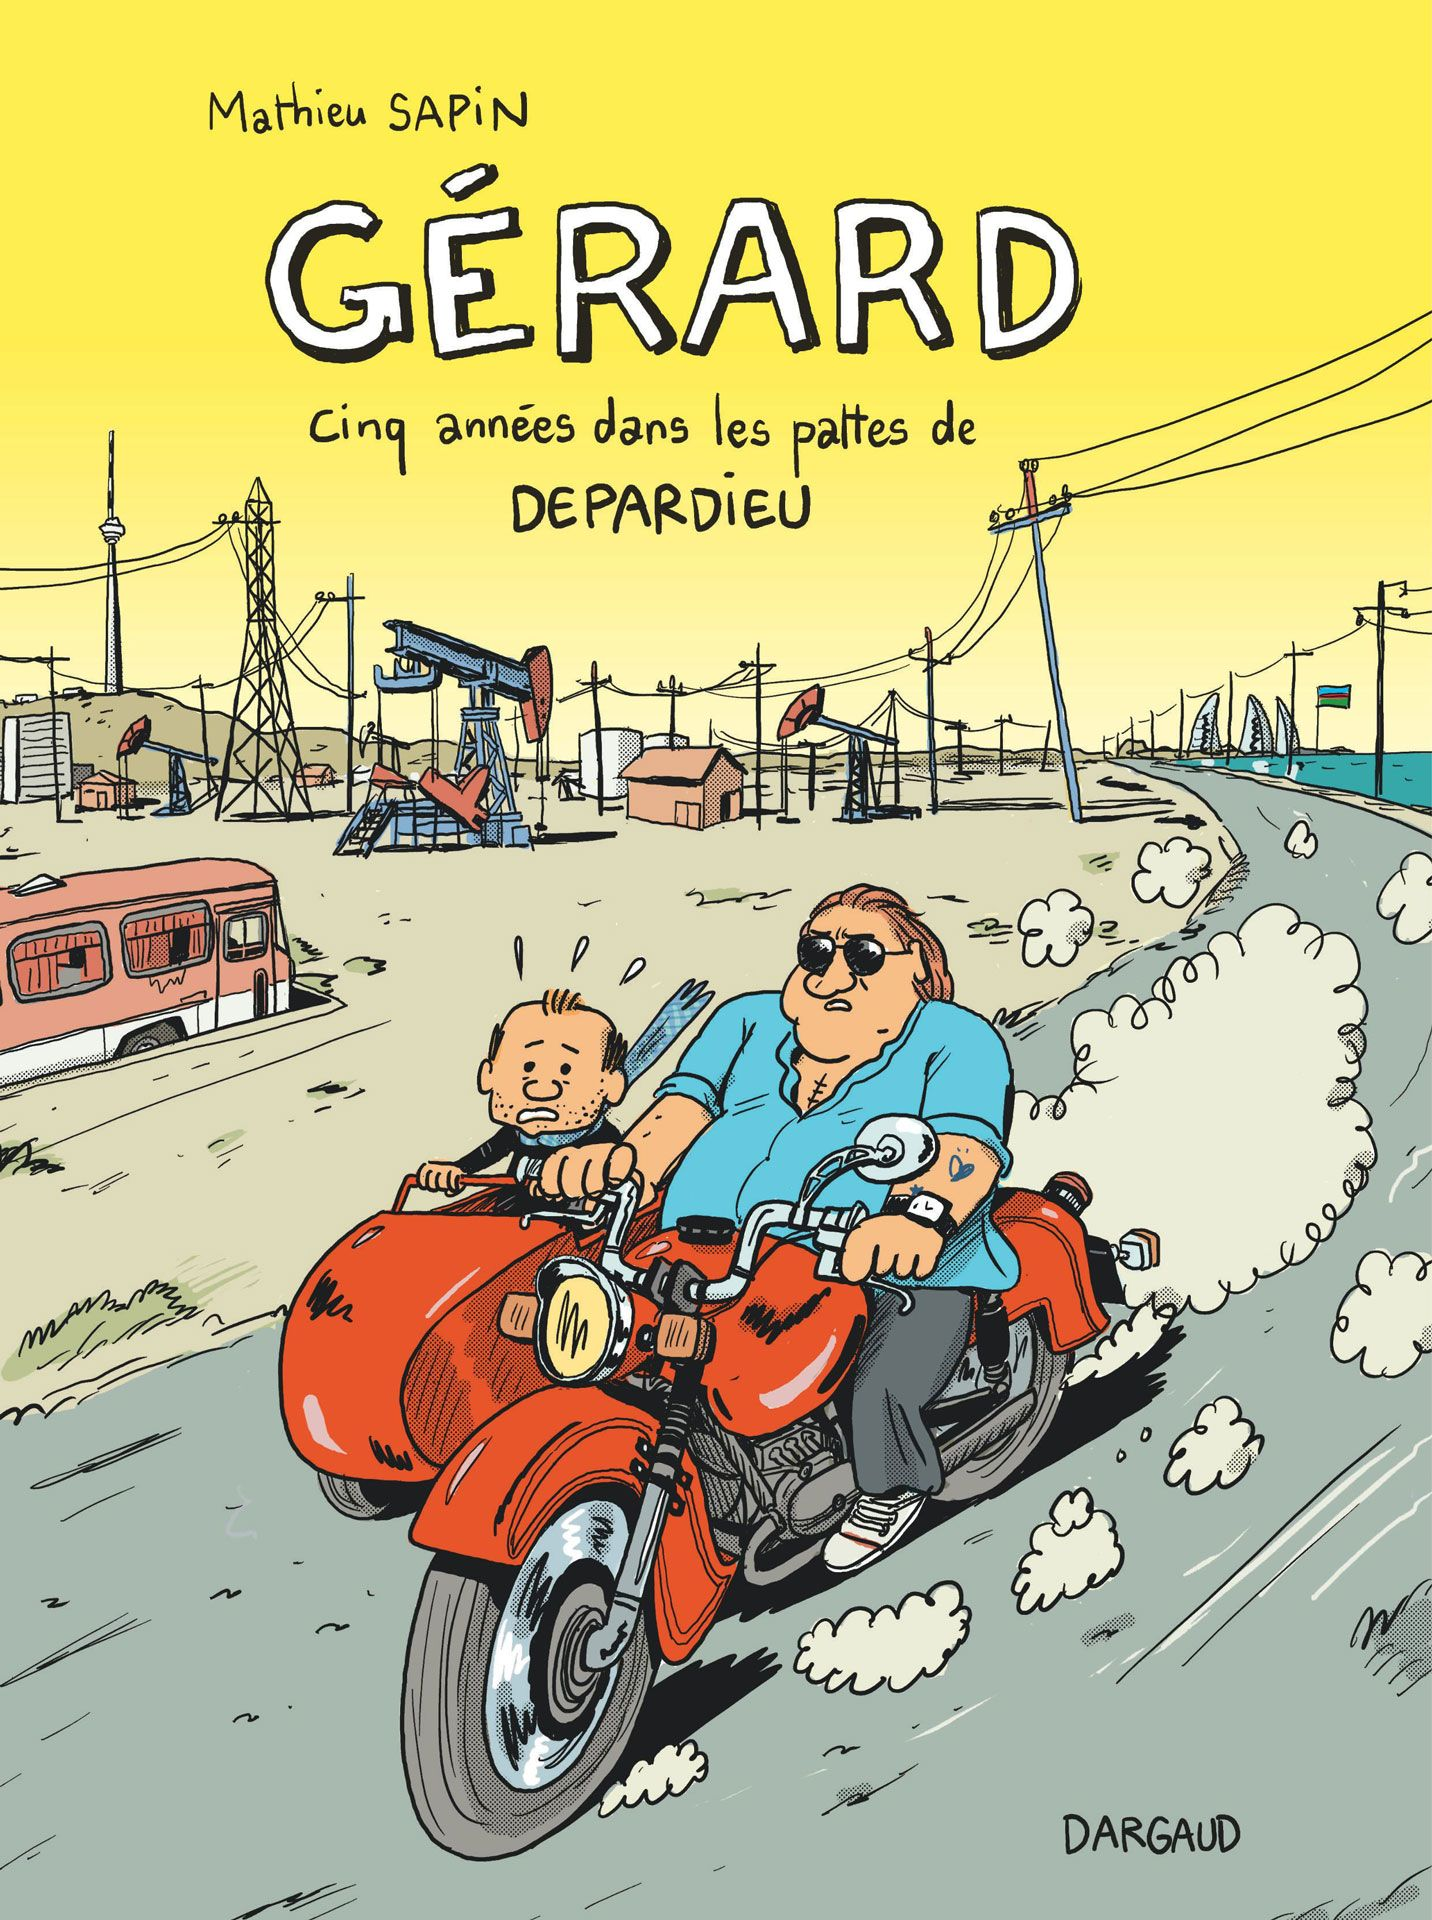 cover of comic Gerard by Mathieu Sapin